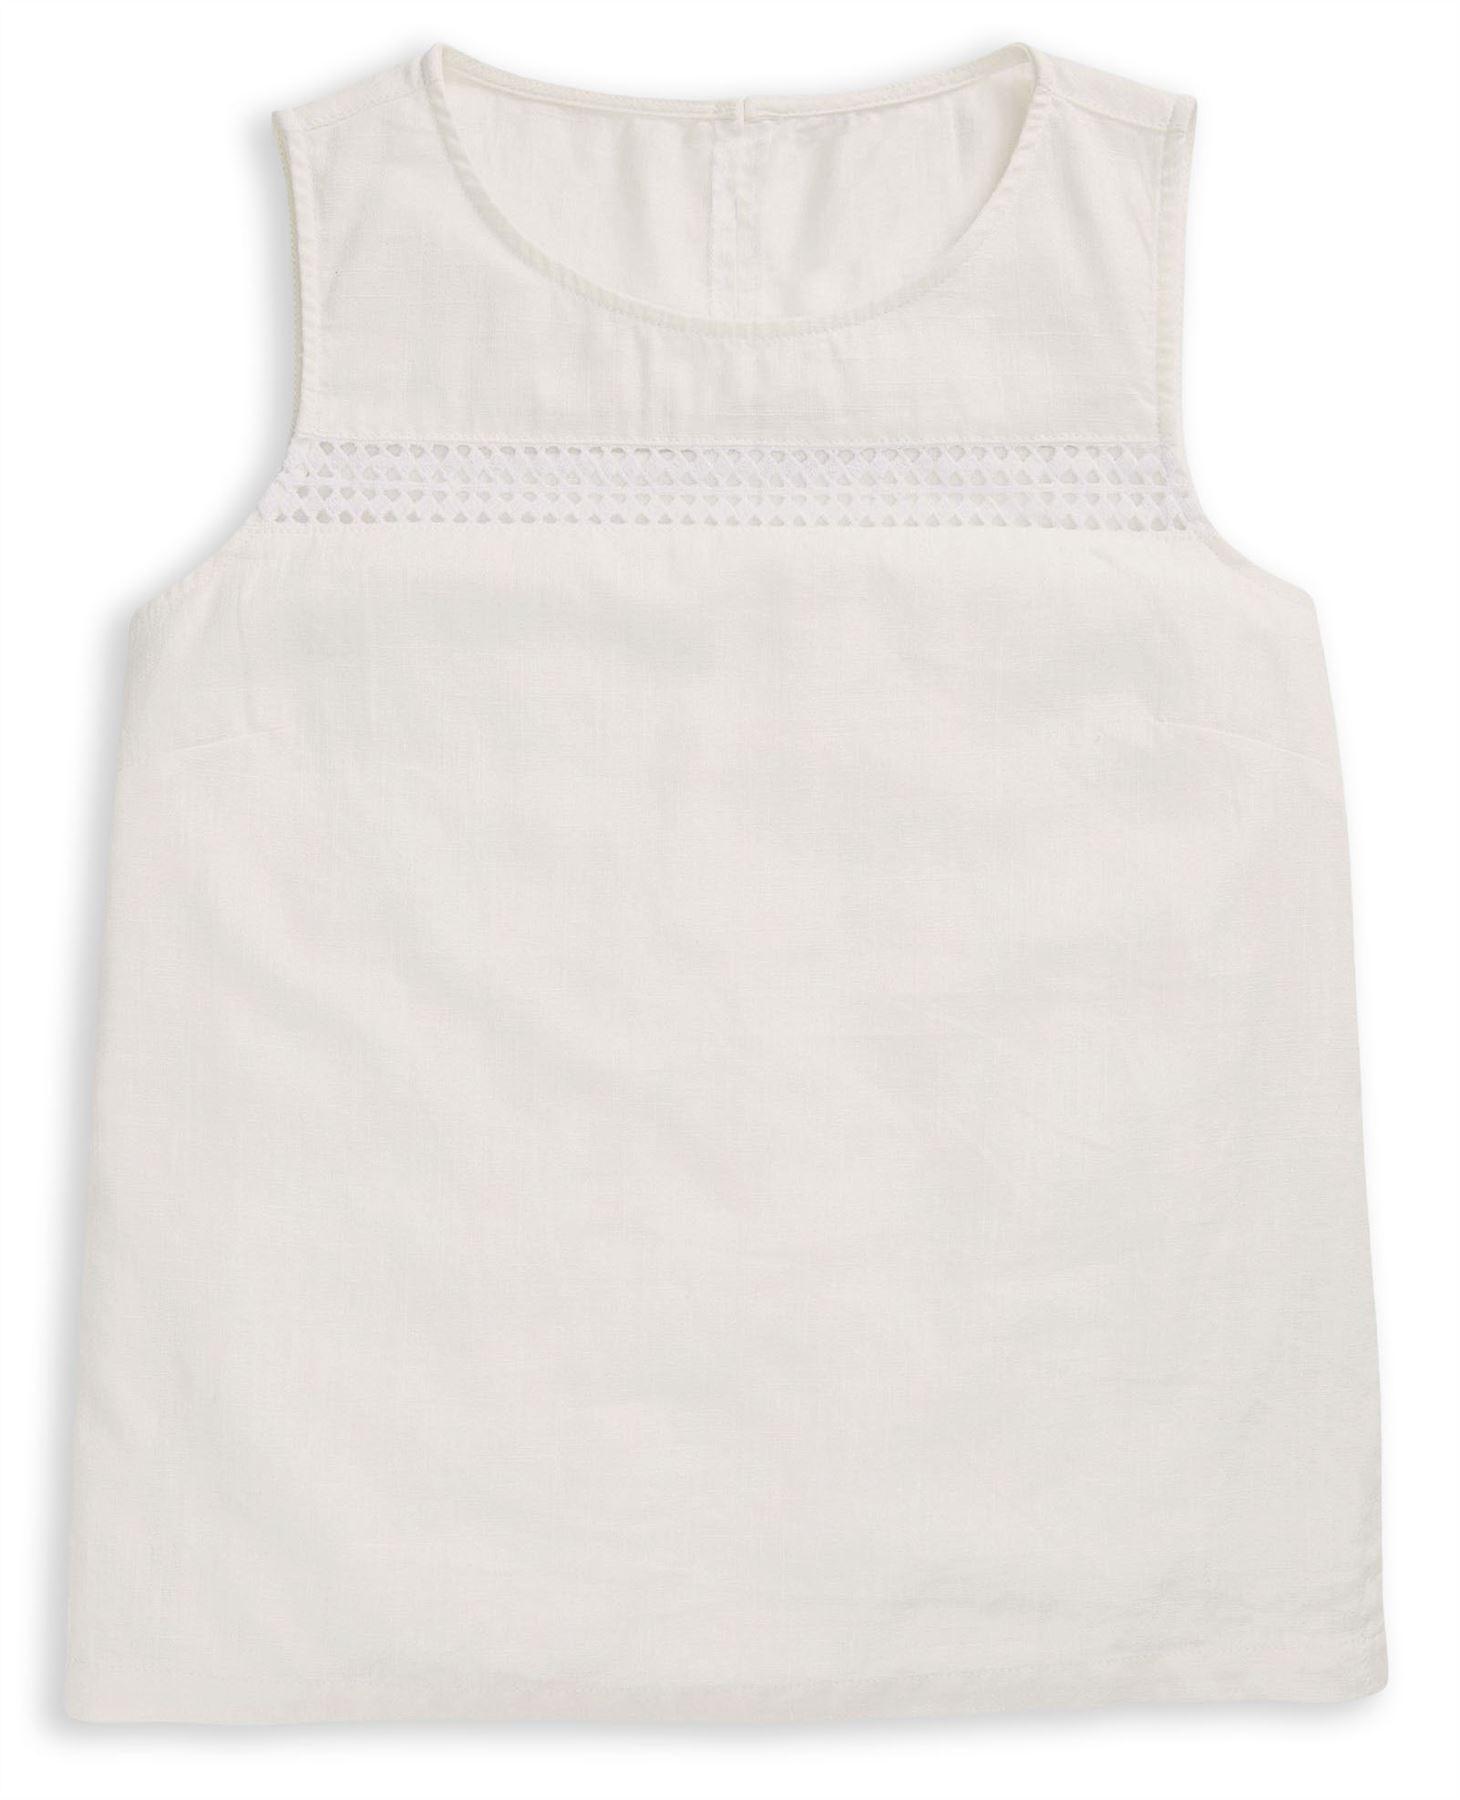 NEXT-Womens-Linen-Sleeveless-Boxy-Top-SALE-RRP-18 thumbnail 24